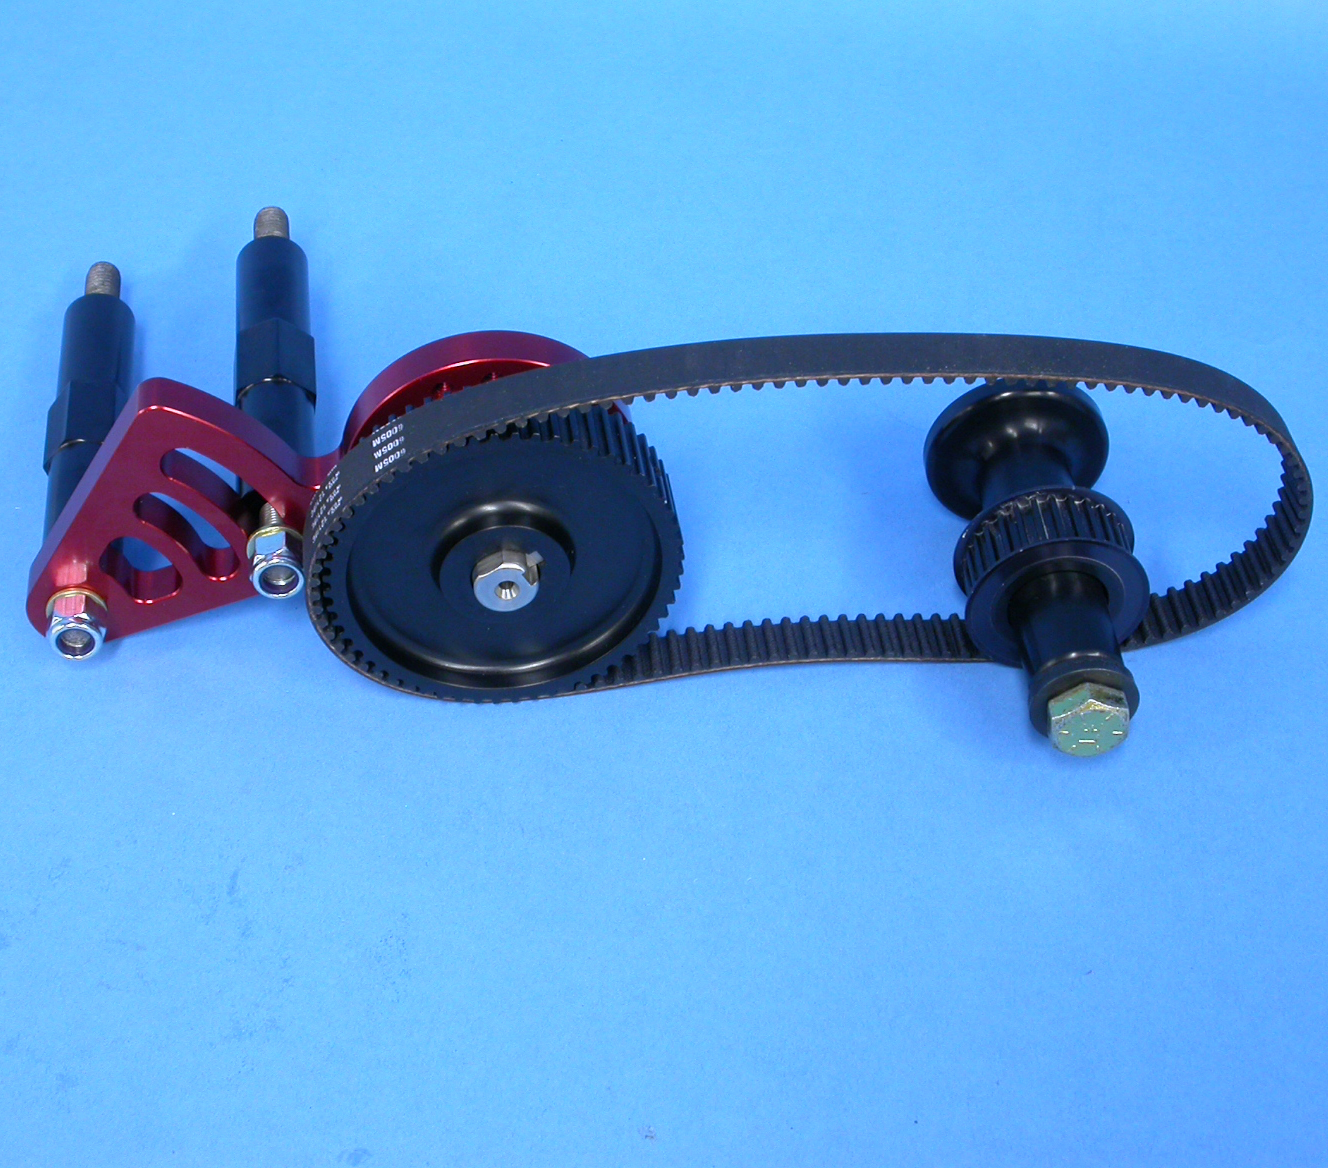 Waterman Sbc Belt Drive Fuel Pump Kit W Kinsler Brackets